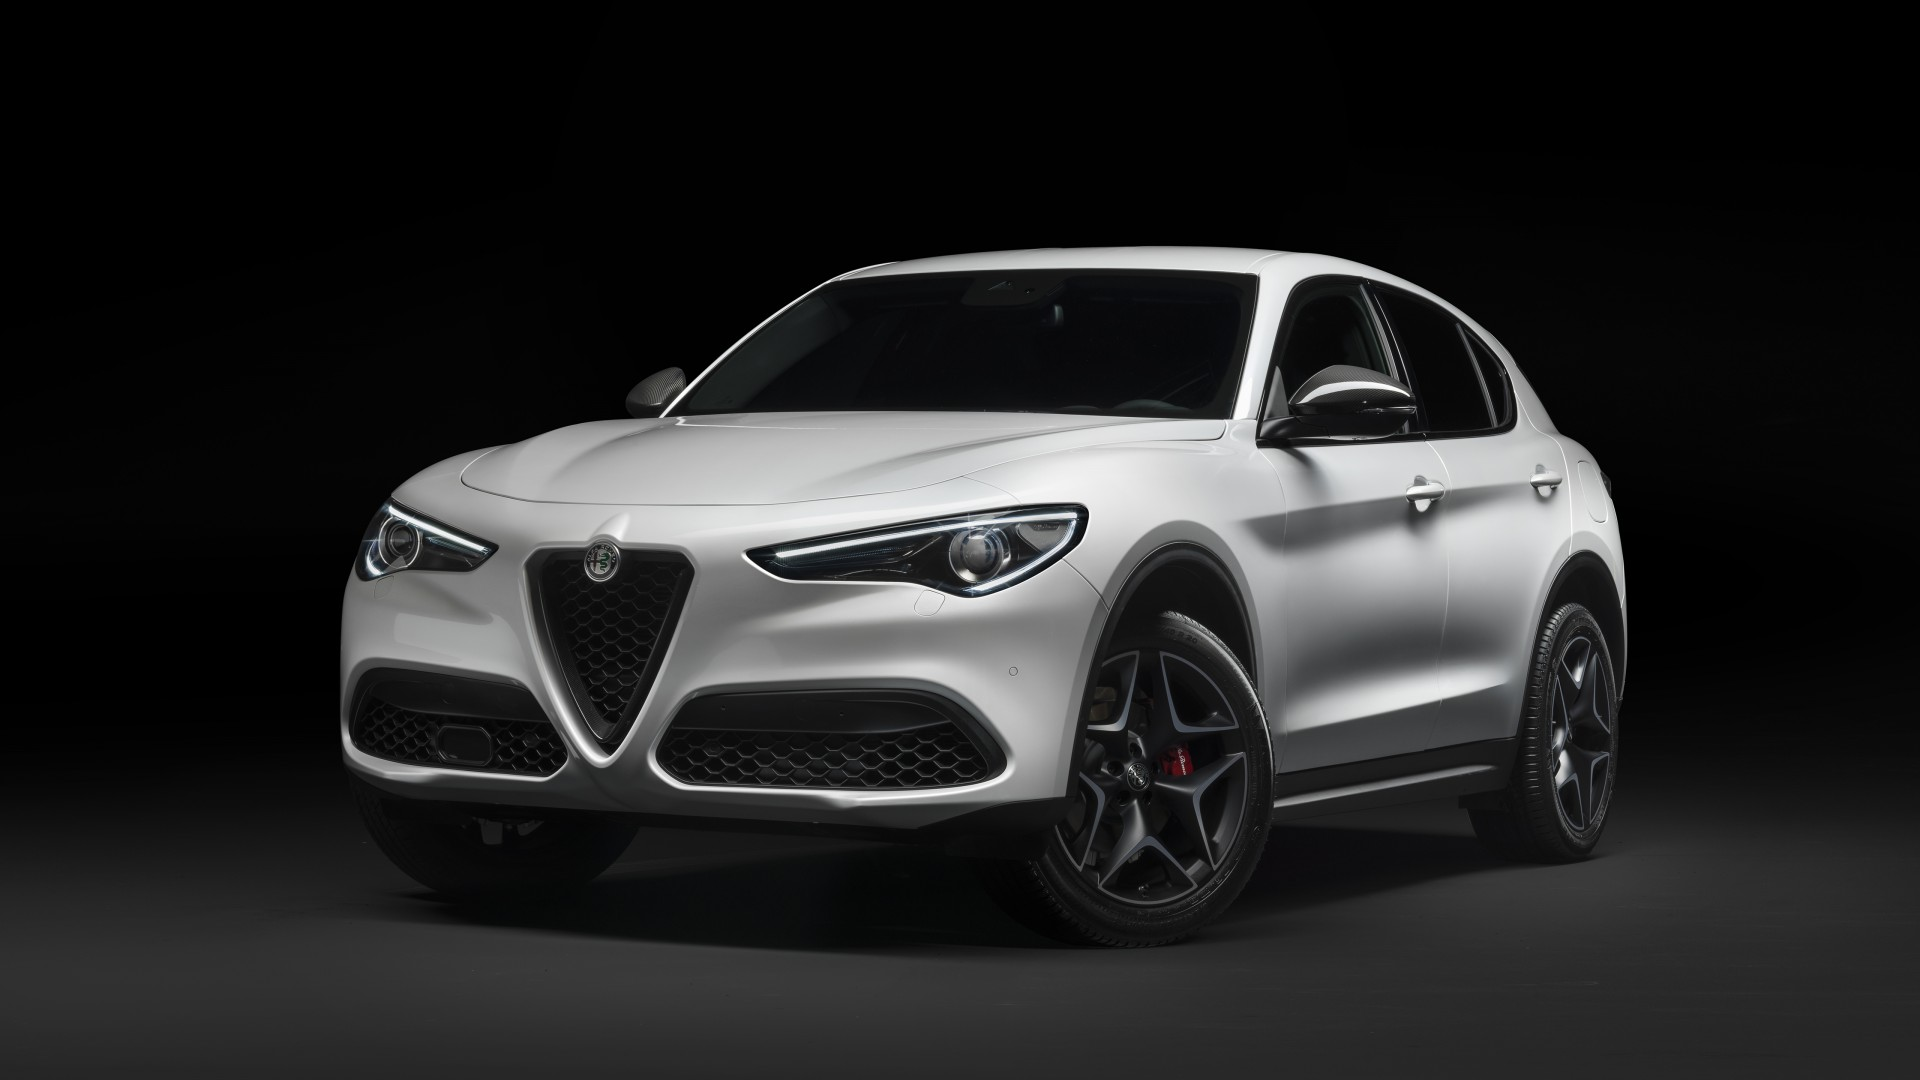 Ultra Hd Wallpapers Iphone X Alfa Romeo Stelvio Ti 2019 5k Wallpaper Hd Car